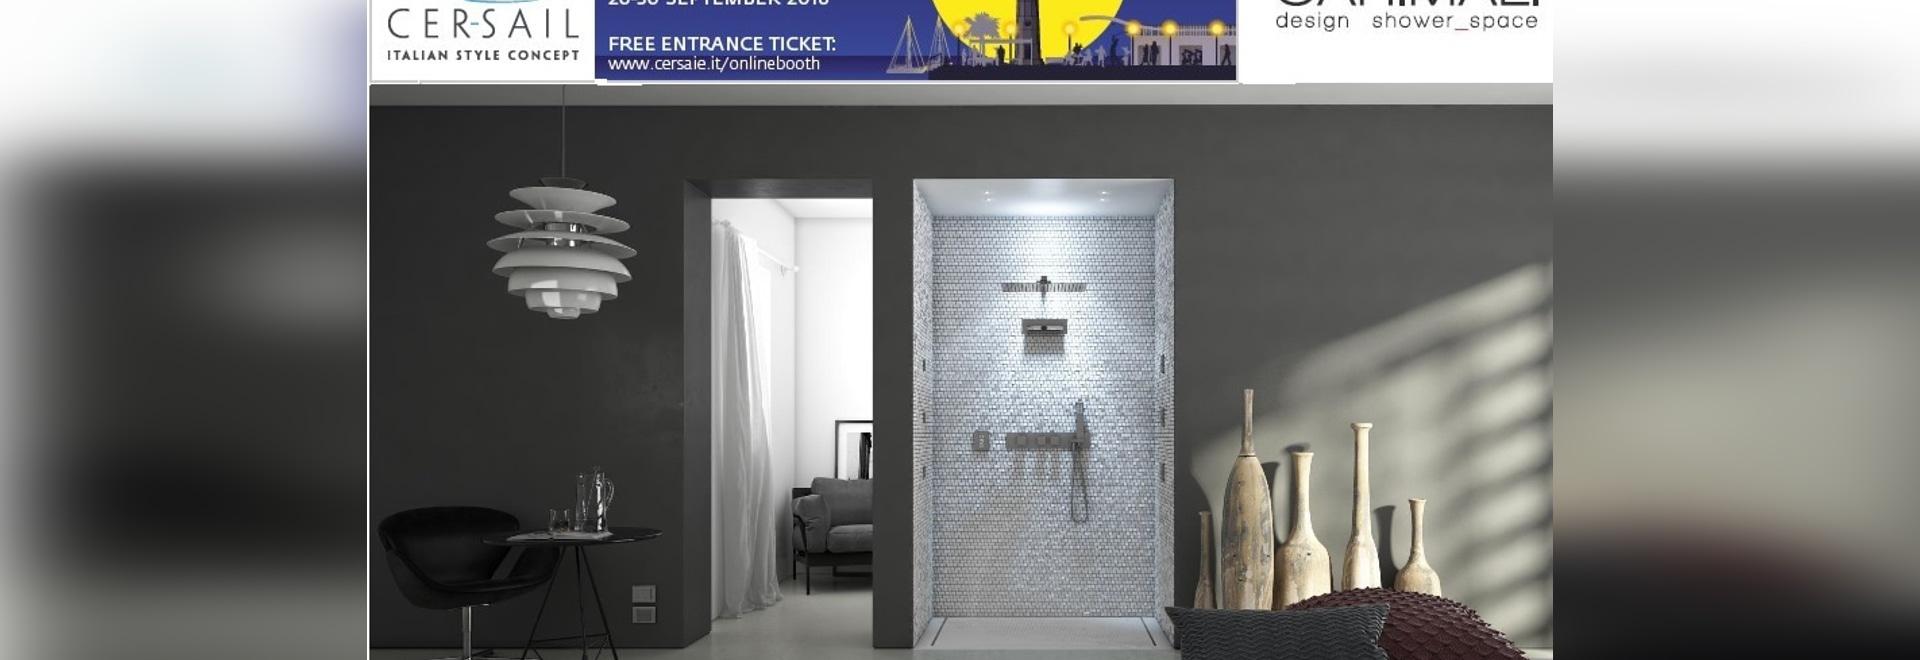 CARIMALI design shower_space at CERSAIE 2016